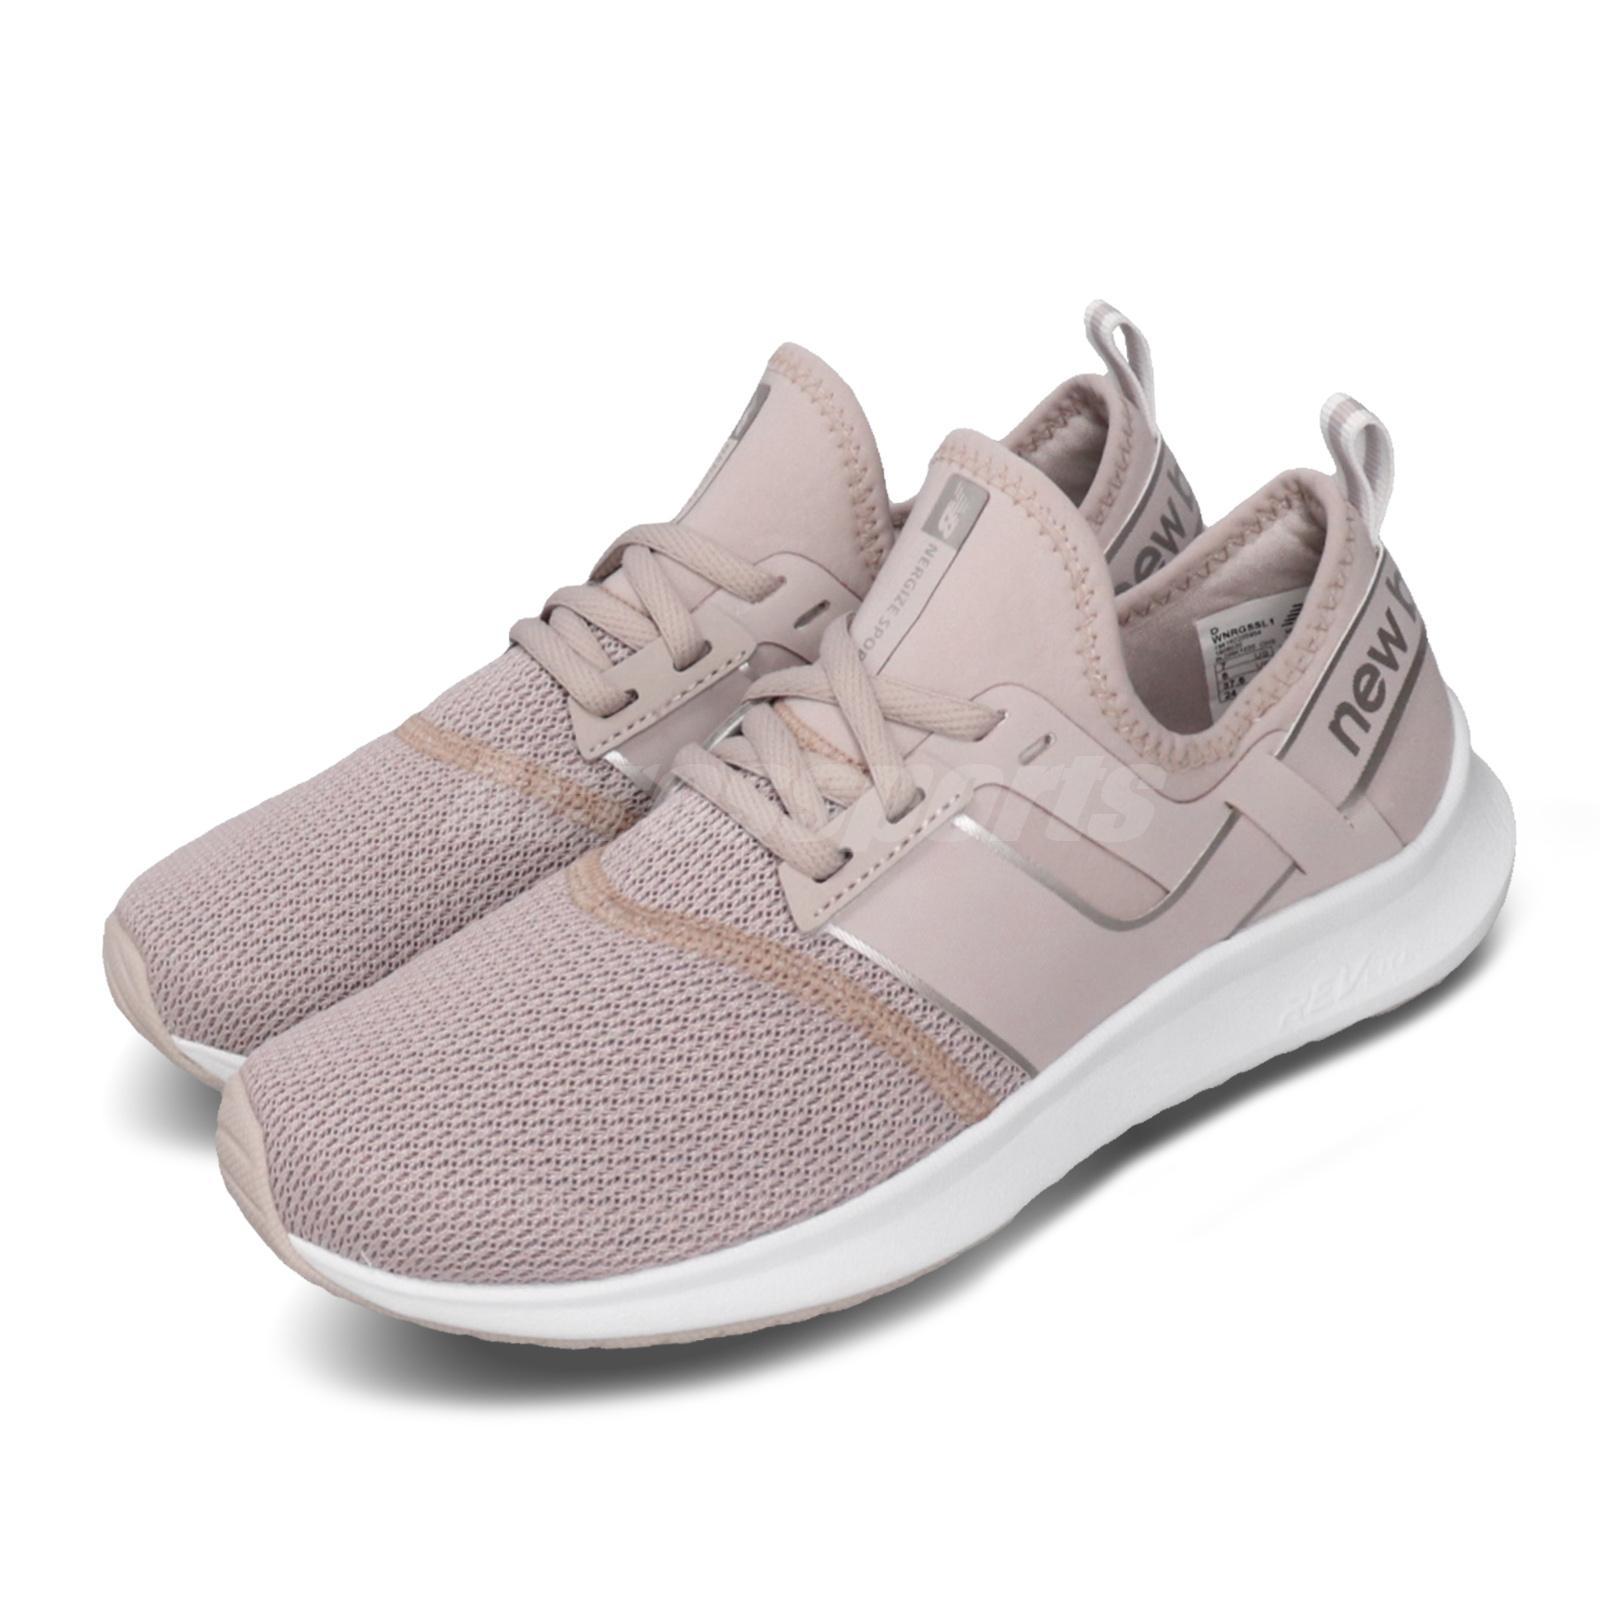 New Balance Nergize Sport Wide Pink